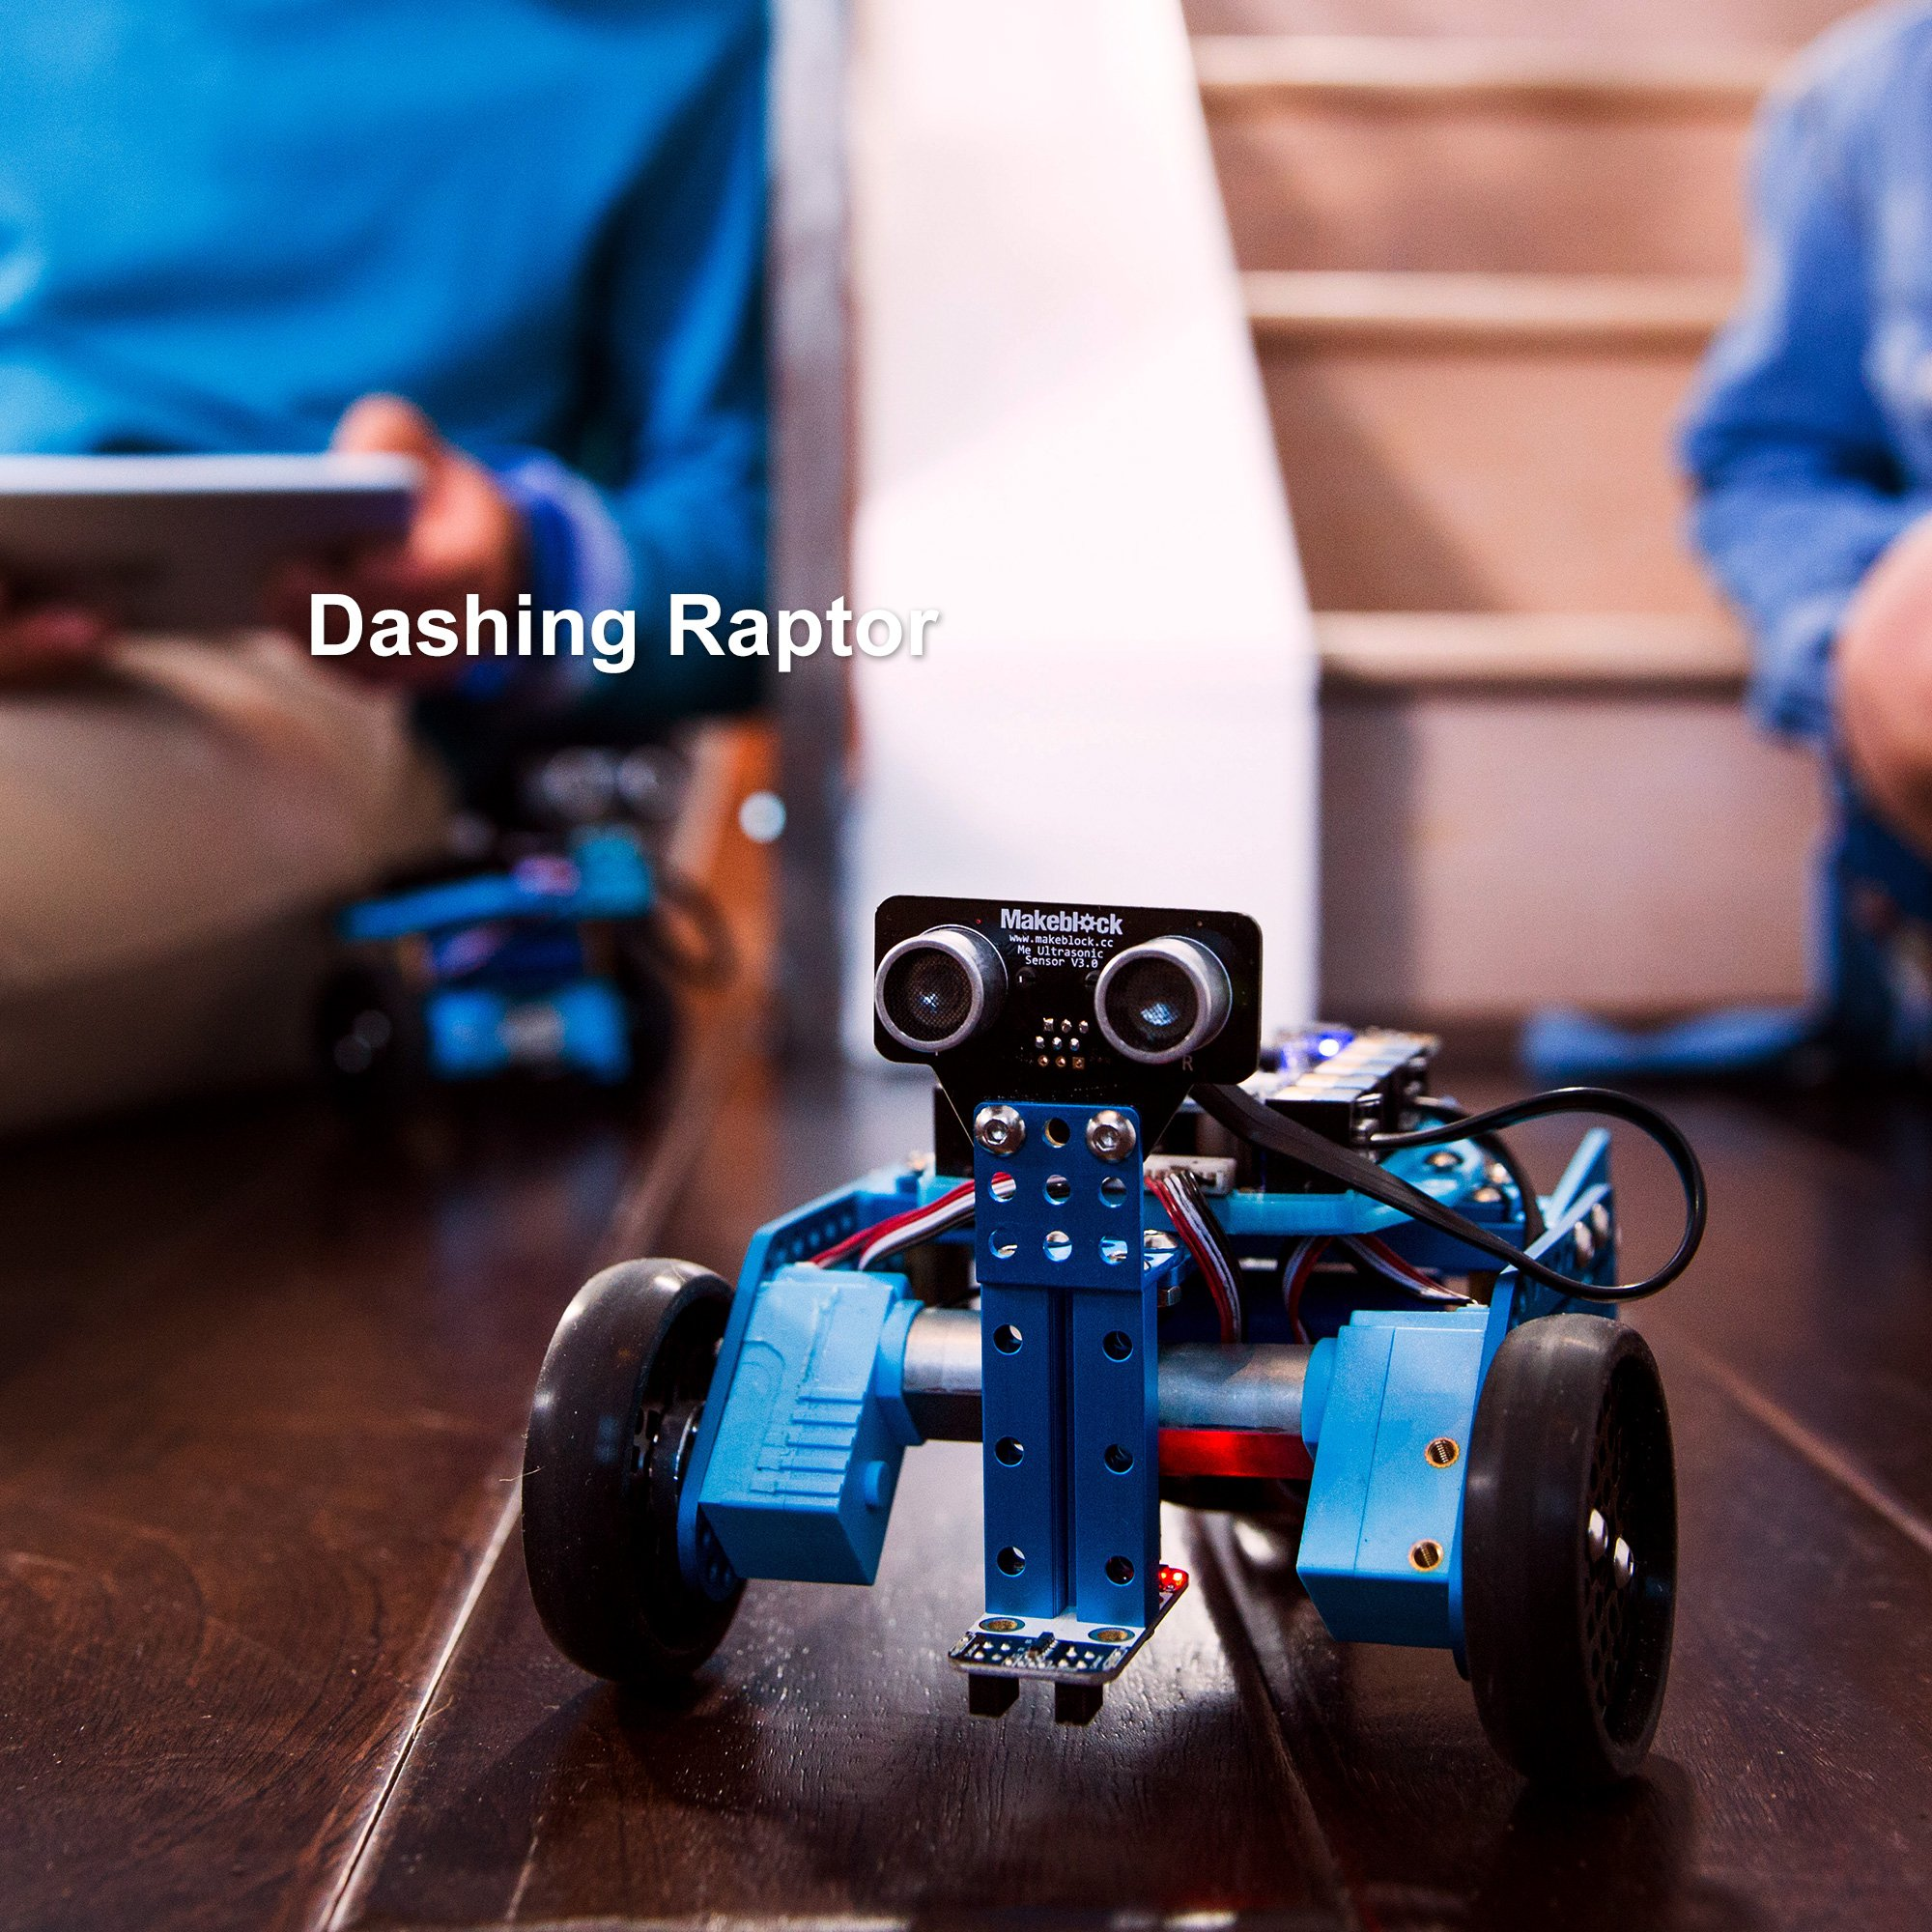 Makeblock Programmable mBot Ranger Robot Kit, STEM Educational Engineering Design & Build 3 in 1 Programmable Robotic System Kit - Ages 10+ by Makeblock (Image #3)